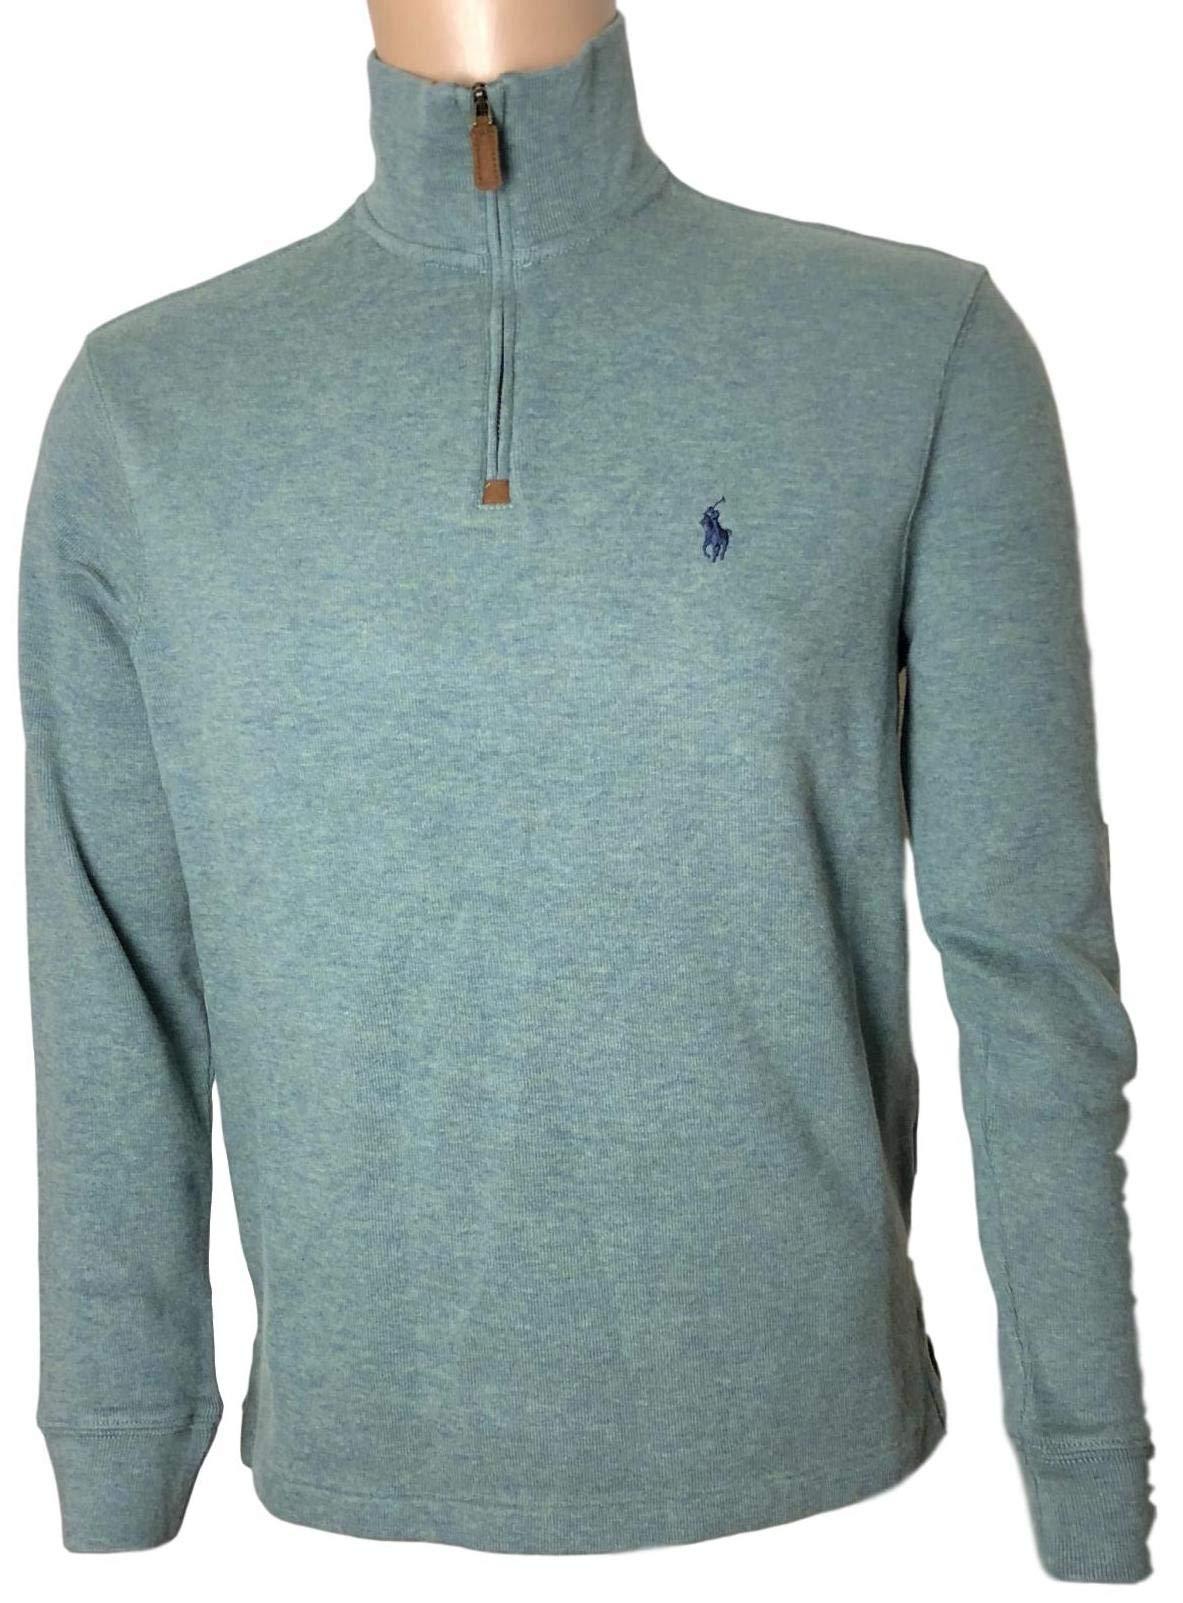 Polo Ralph Lauren Mens Half Zip French Rib Cotton Sweater (X-Large, Green/Navy Pony)